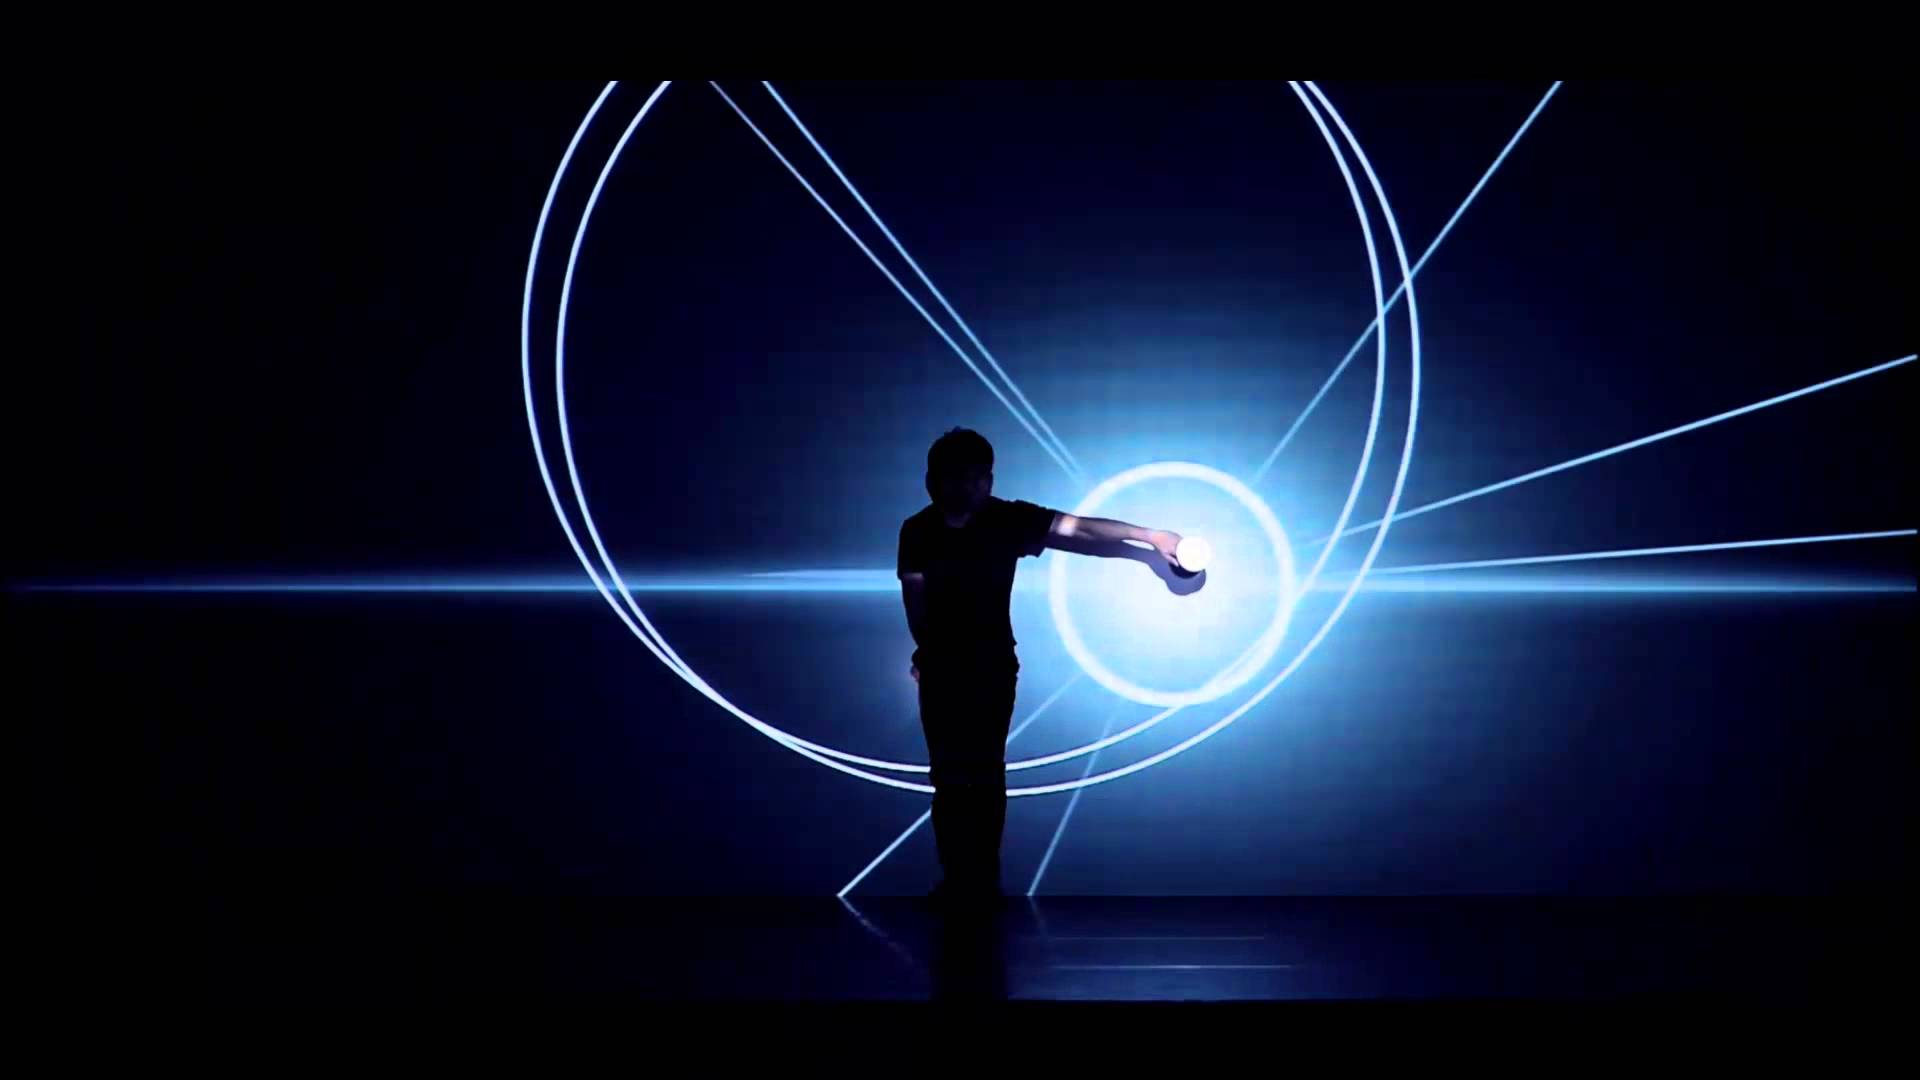 CG技術をパフォーマンスに組み込んだ神技動画